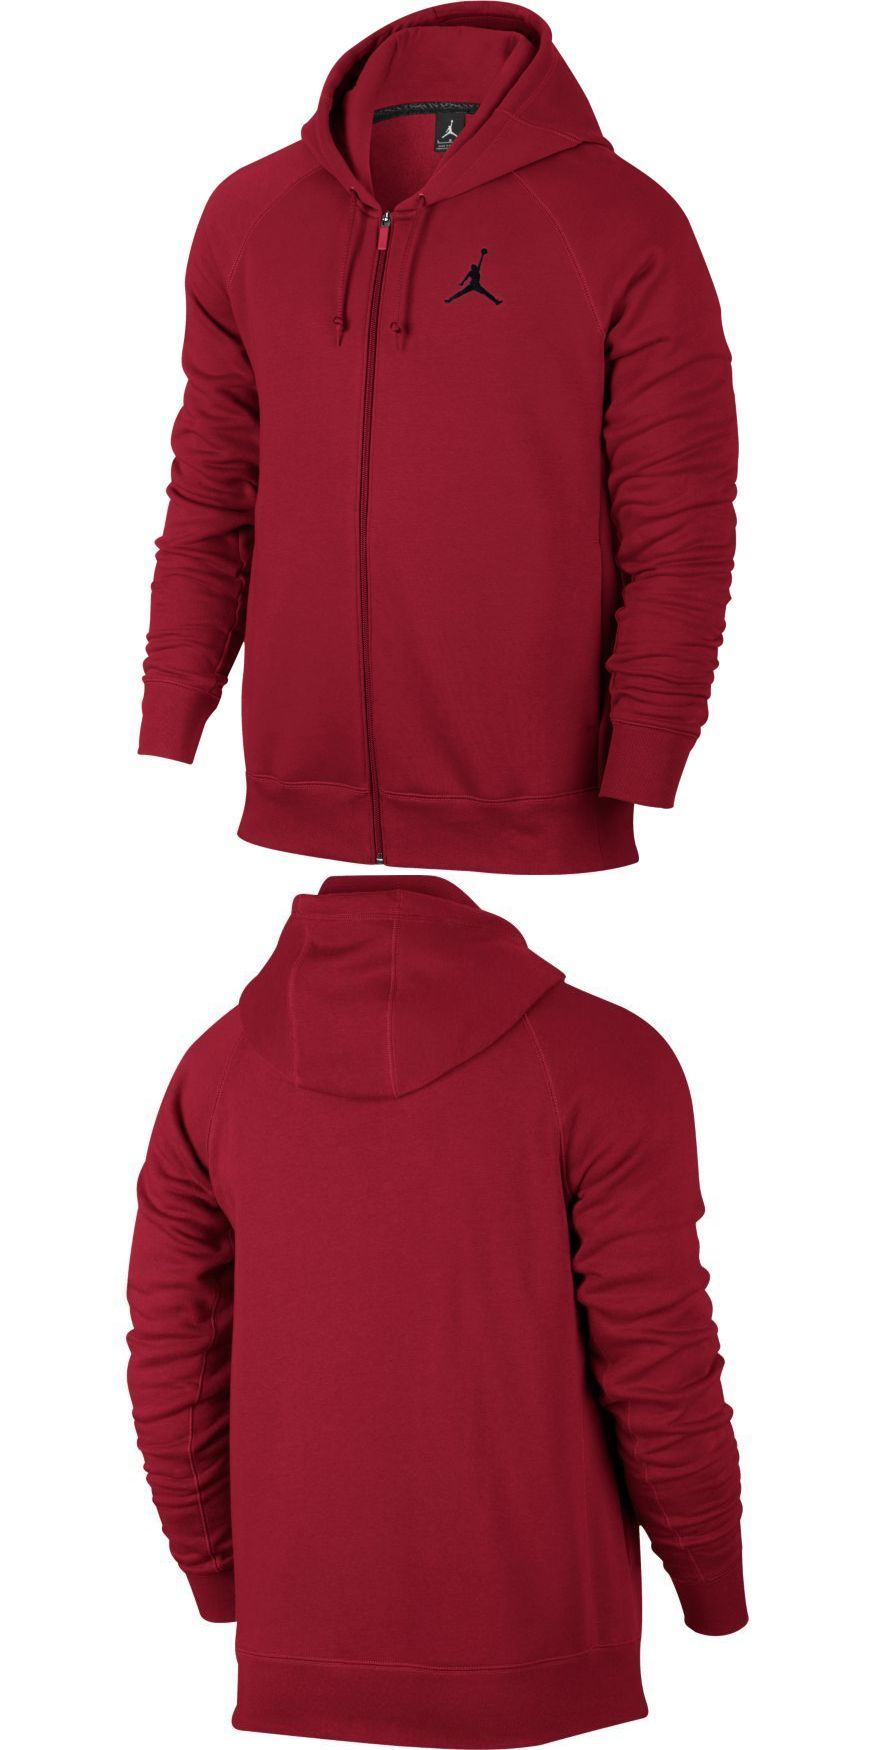 d110c81f3c72 Athletic Apparel 137084  Men Jordan Flight Fleece Full-Zip Hoodie Gym Red  Black  Z 823064-687 -  BUY IT NOW ONLY   44.99 on eBay!